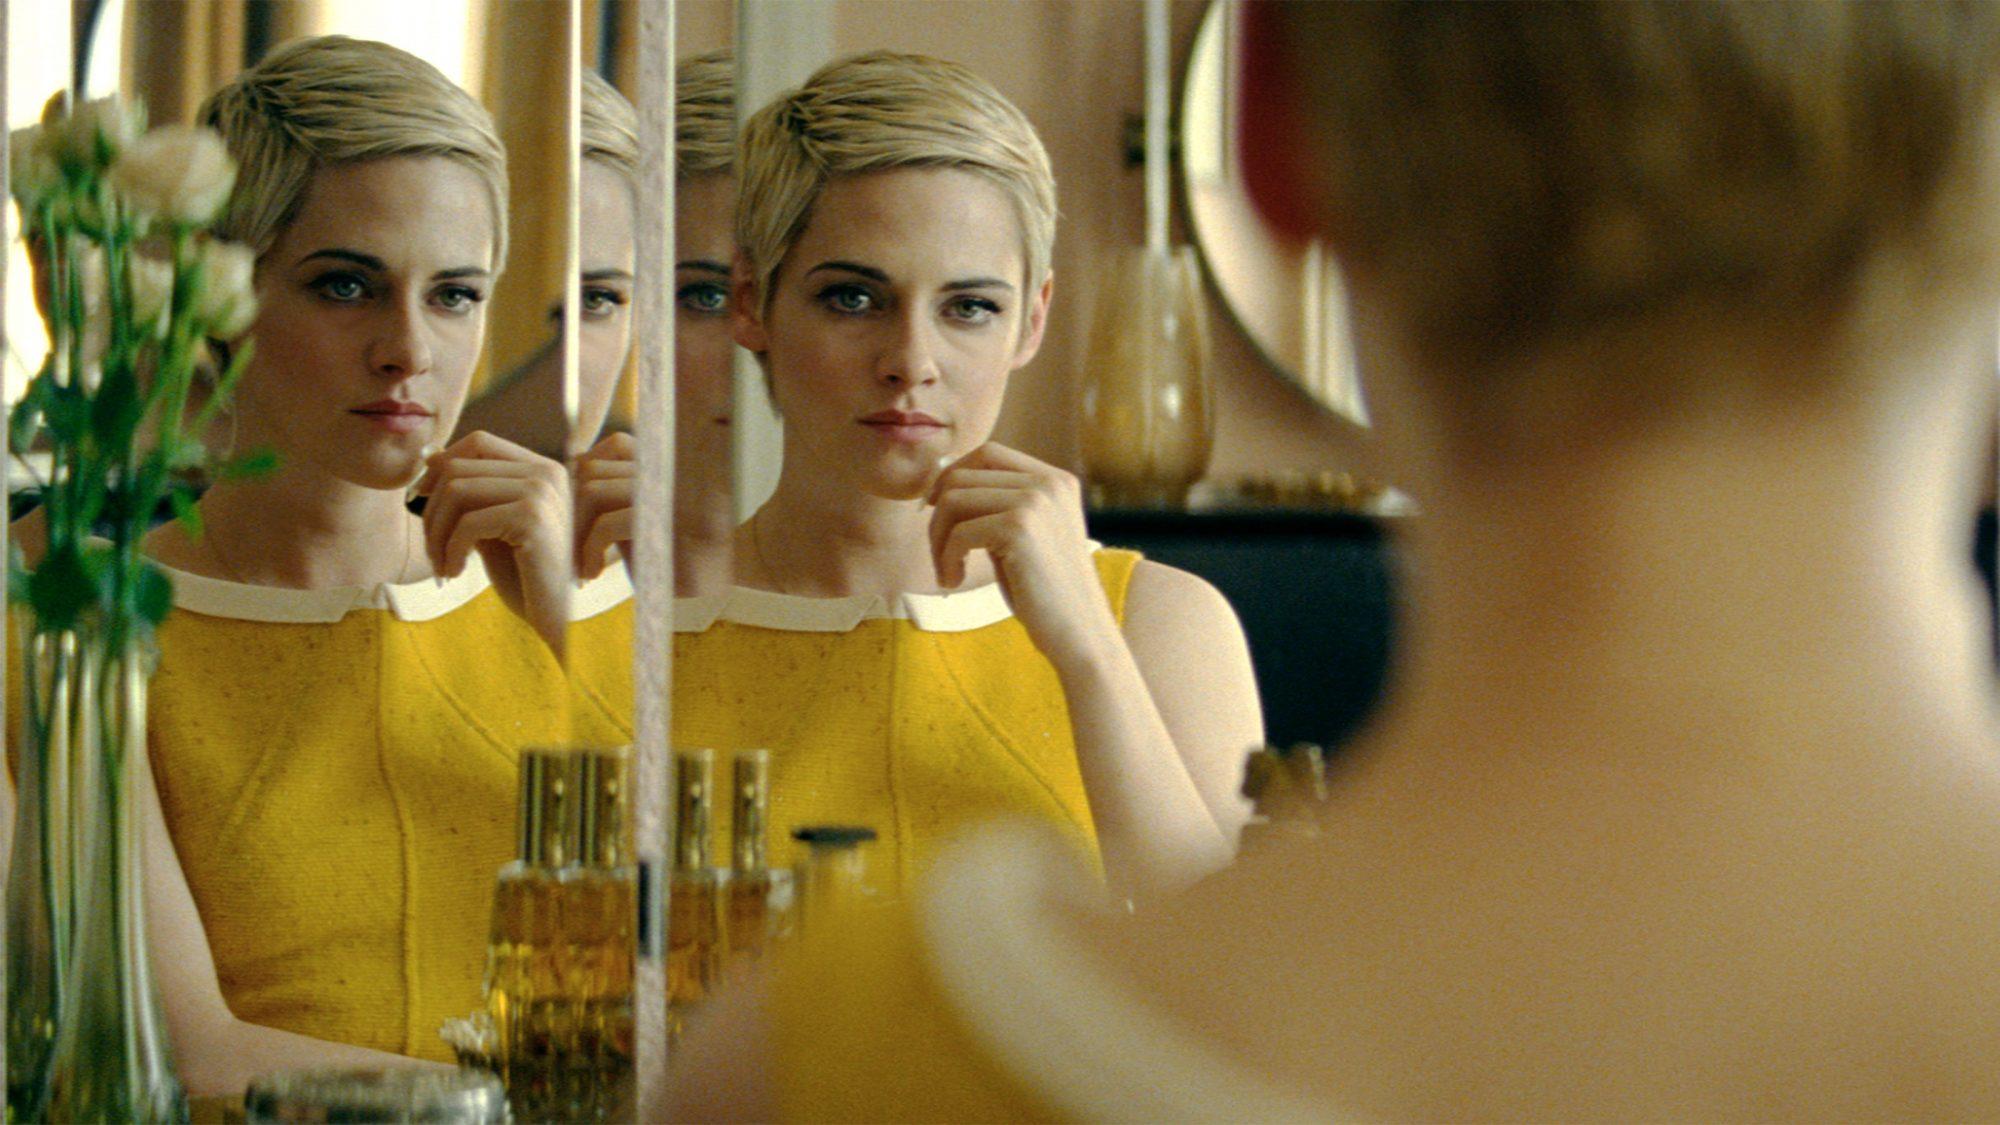 Kristen Stewart praised in Jean Seberg biopic with divisive film reviews